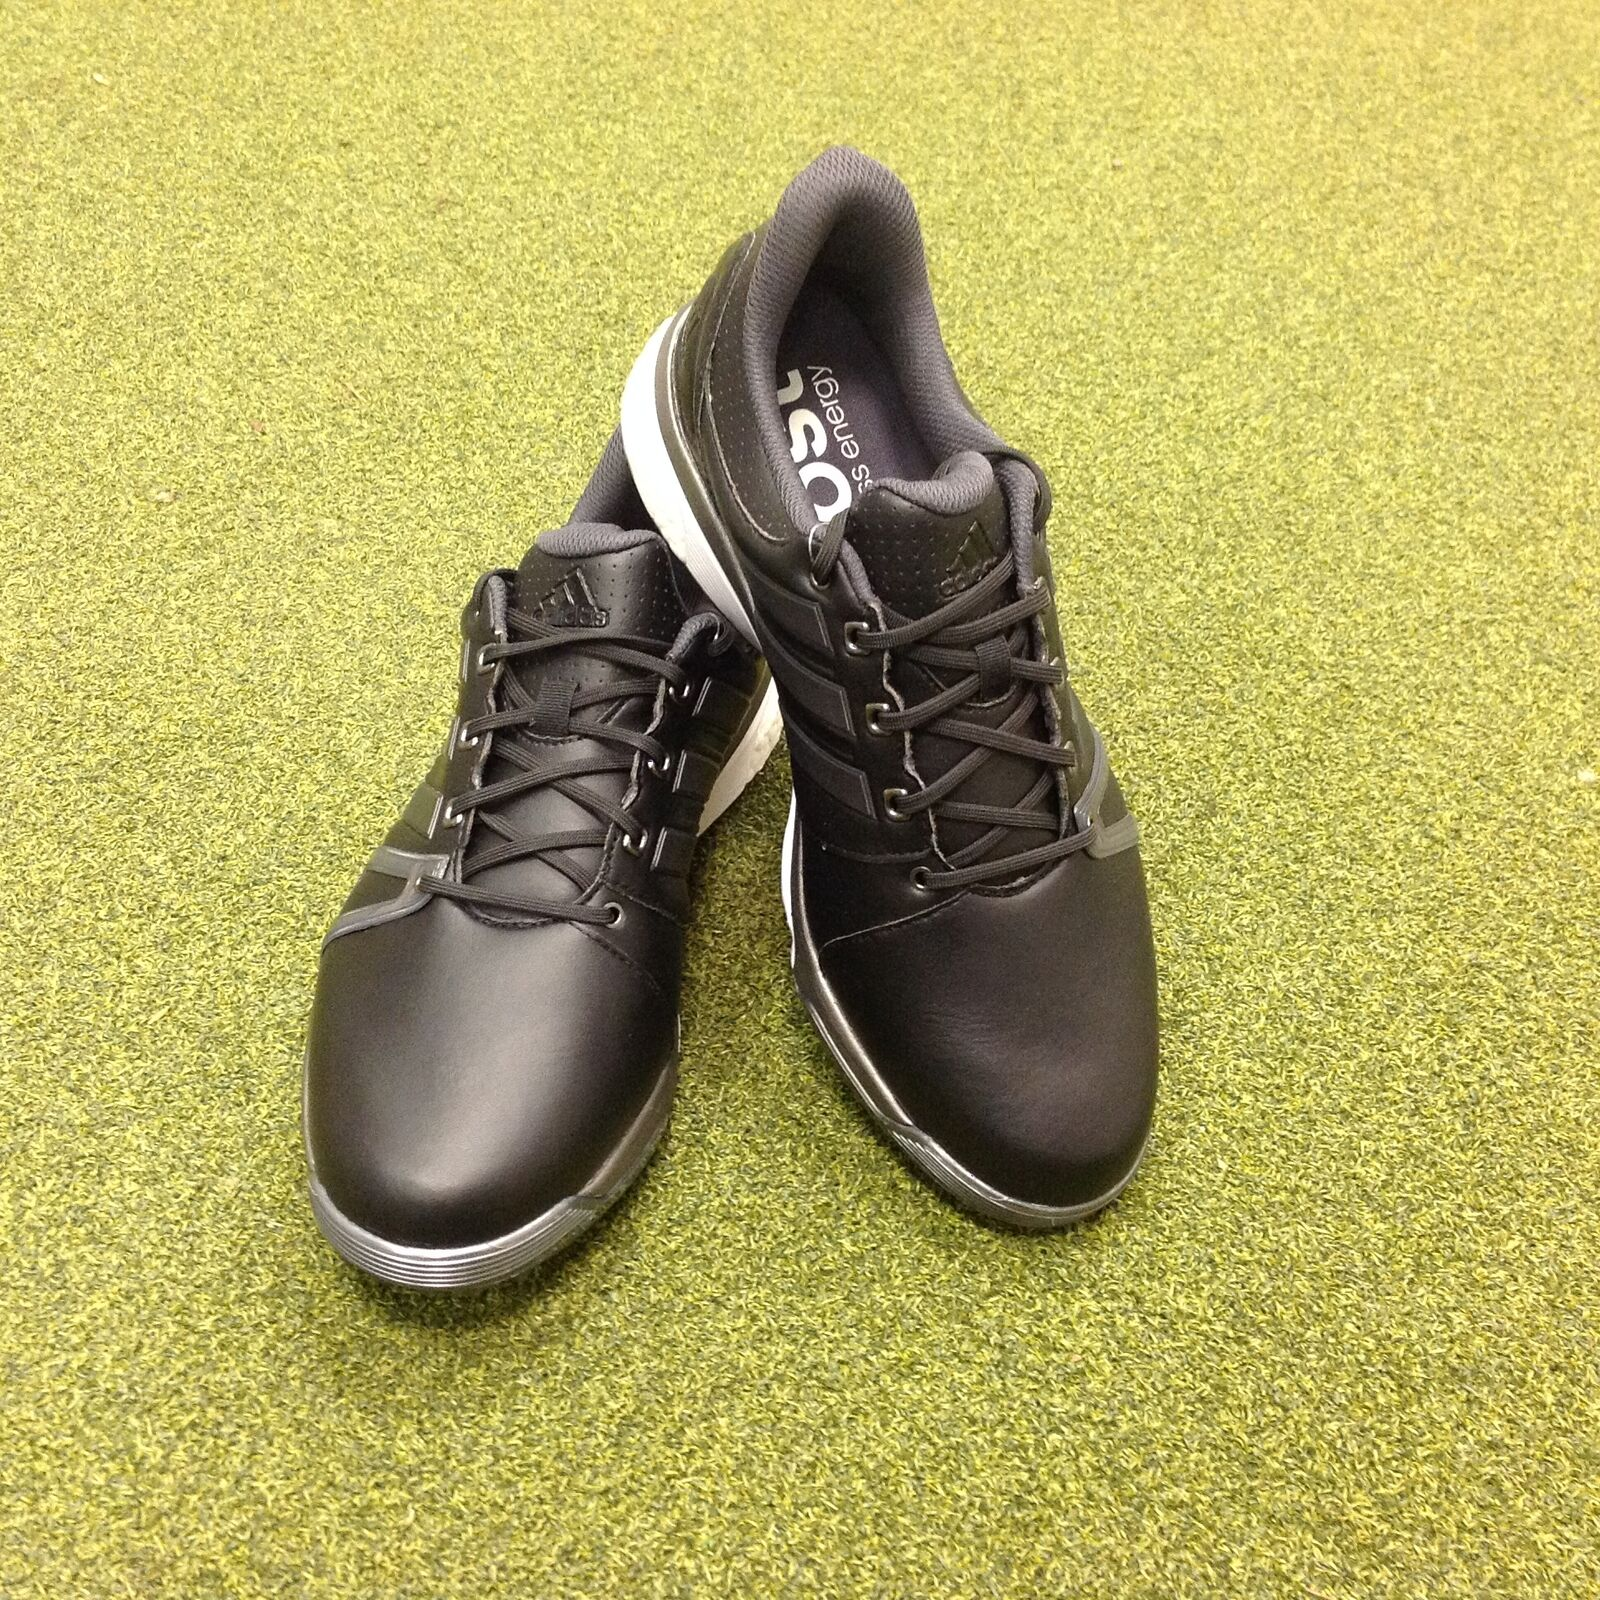 NUOVO Adidas Da Adipower Boost 2 Scarpe Da Adidas Golf-misure (wide) - US 9-EU 42 2/3 d4e9da